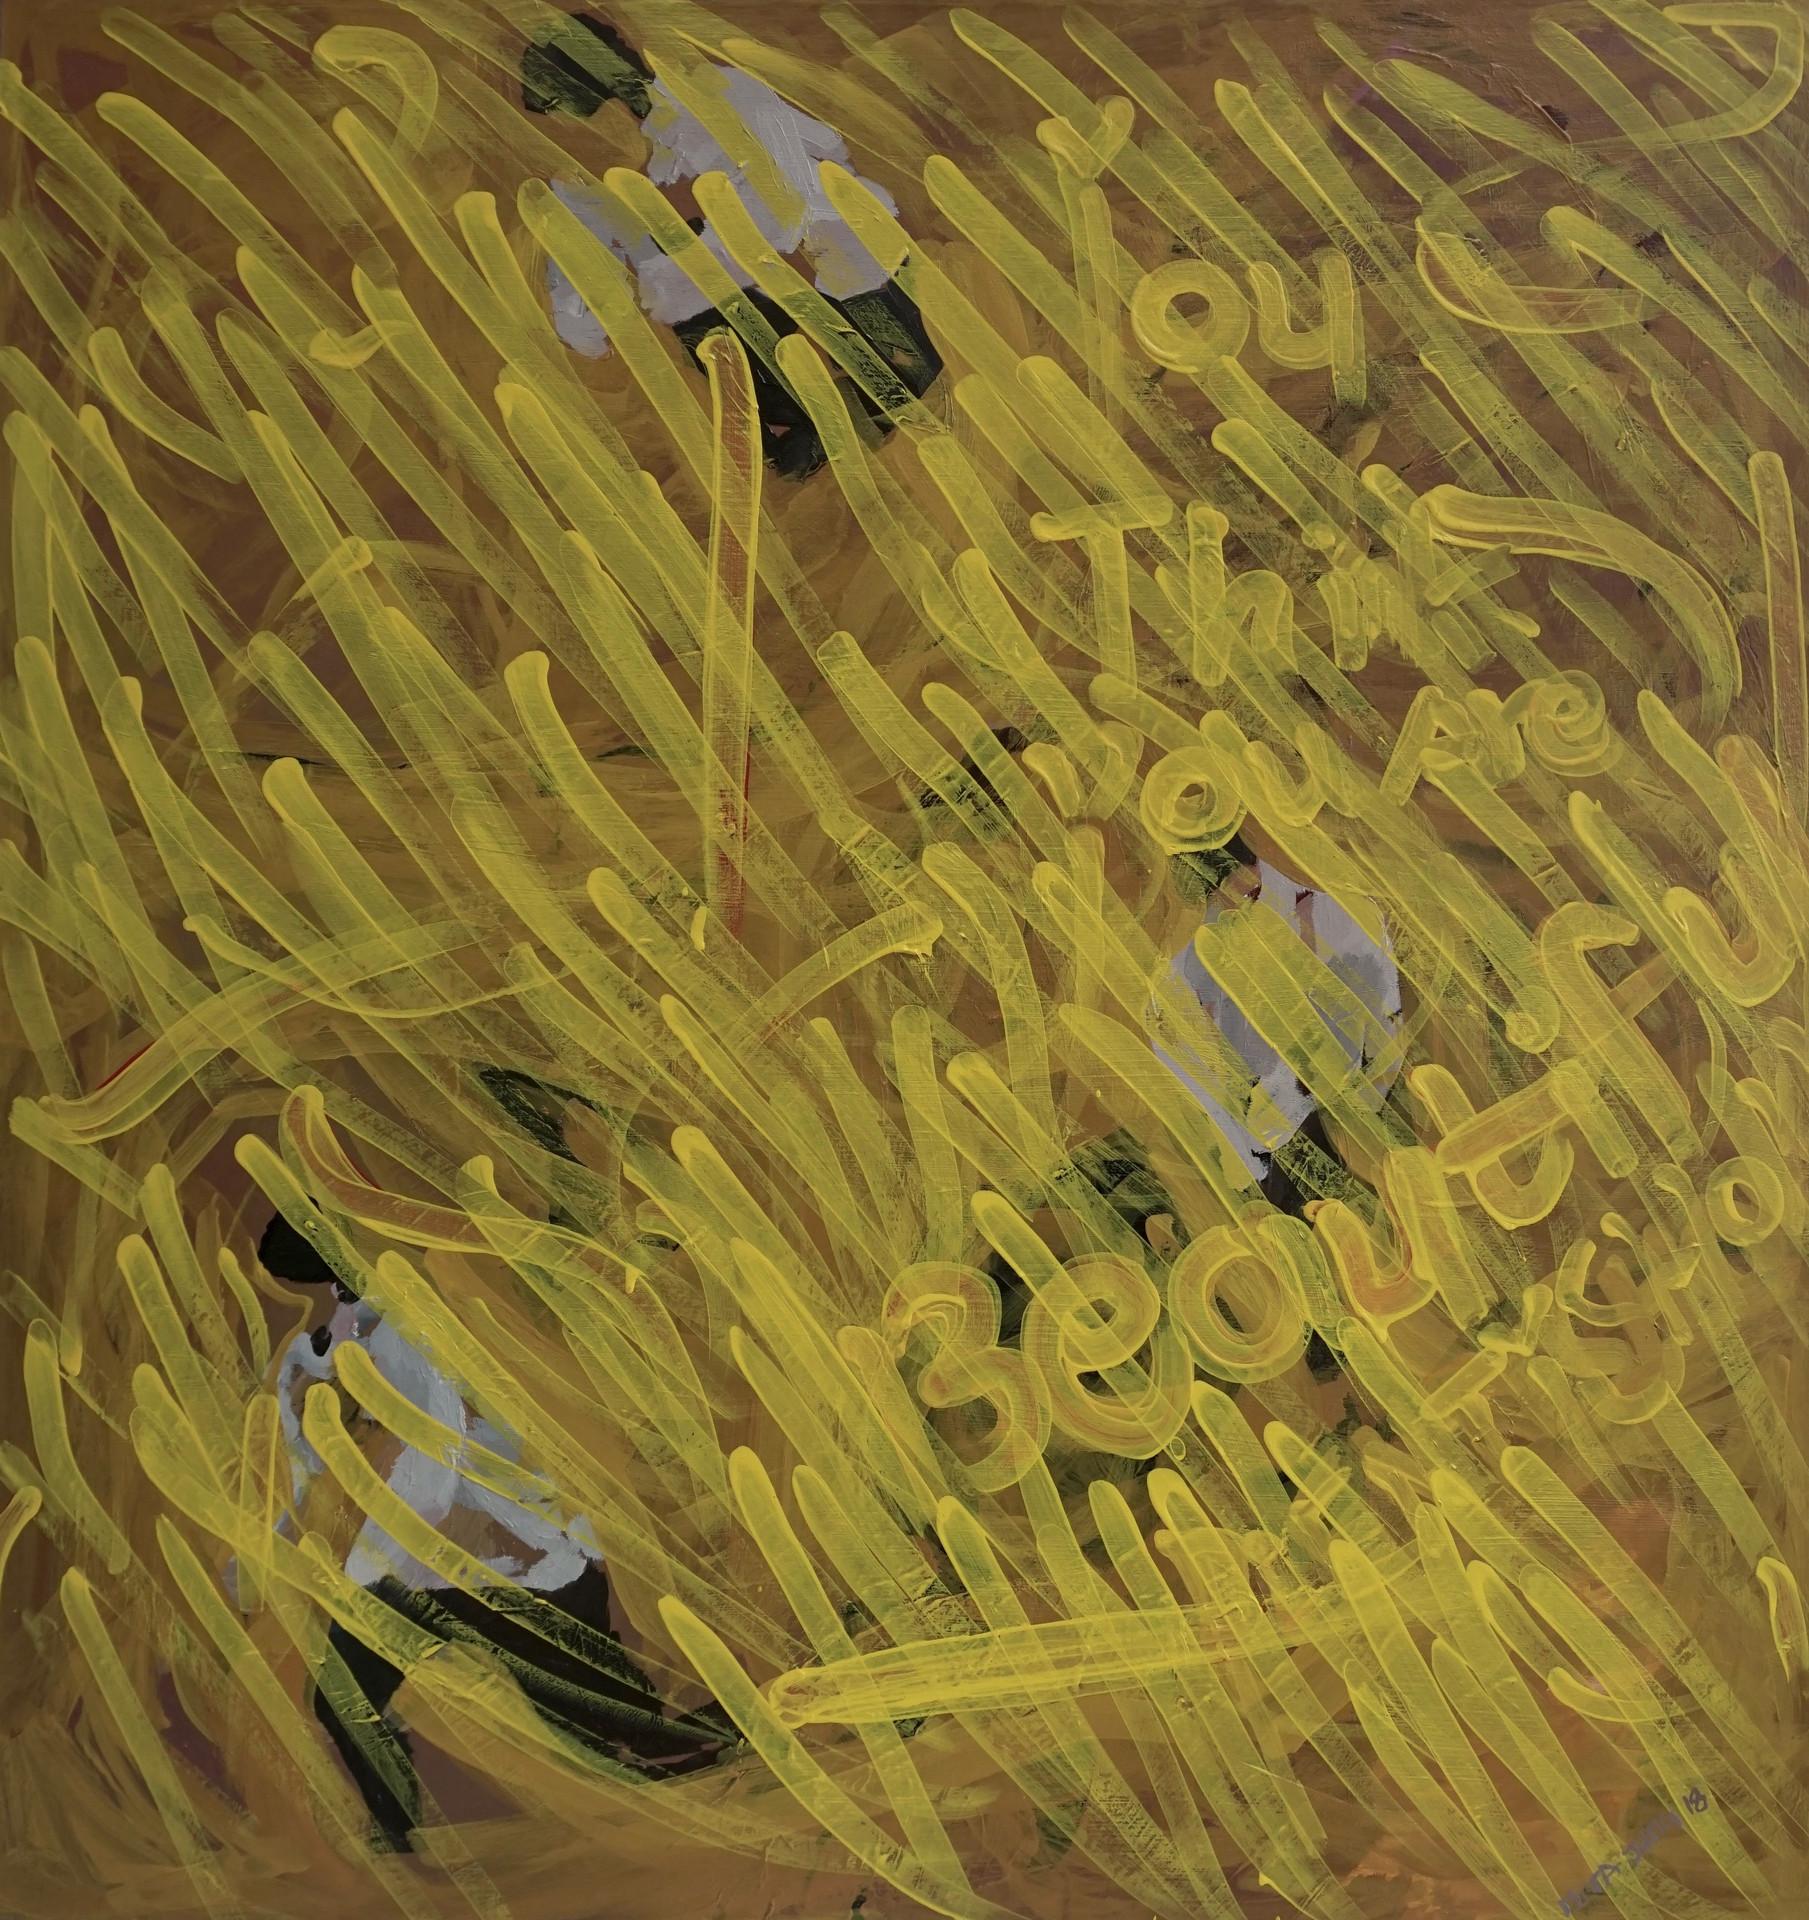 4.Under yellow rain, oil and acrylic on canvas, 34x36, 2018